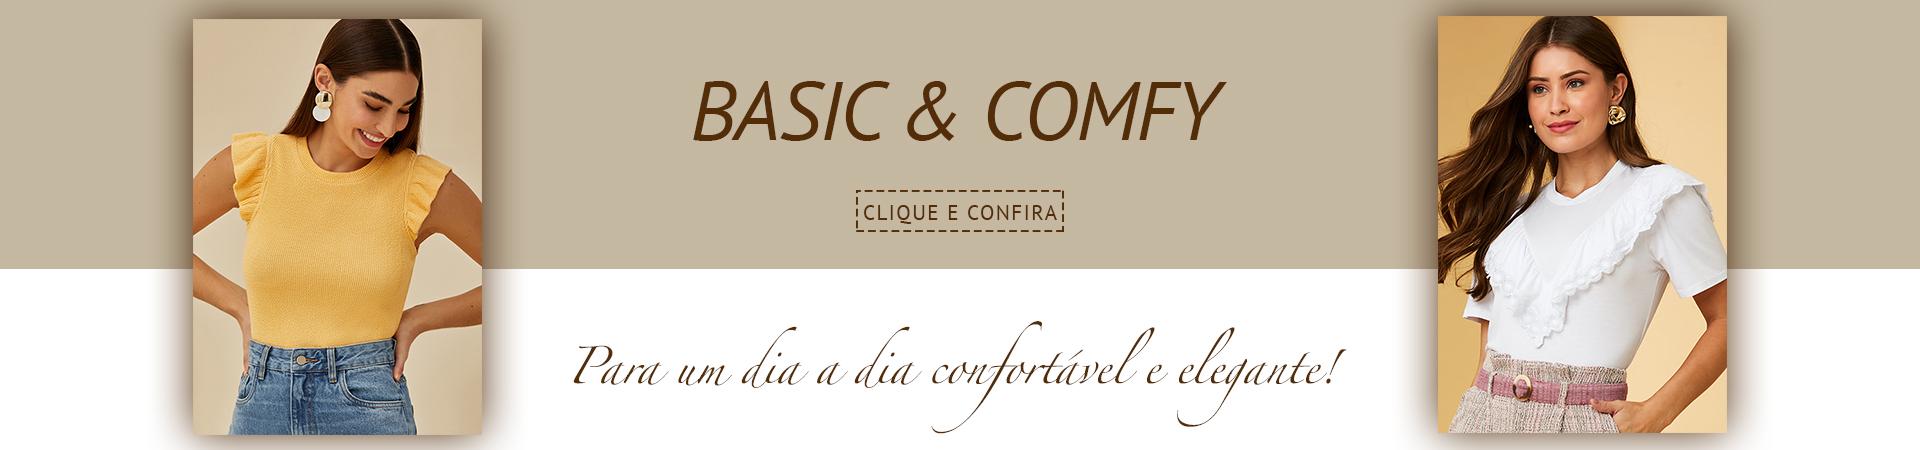 BASIC & COMFY